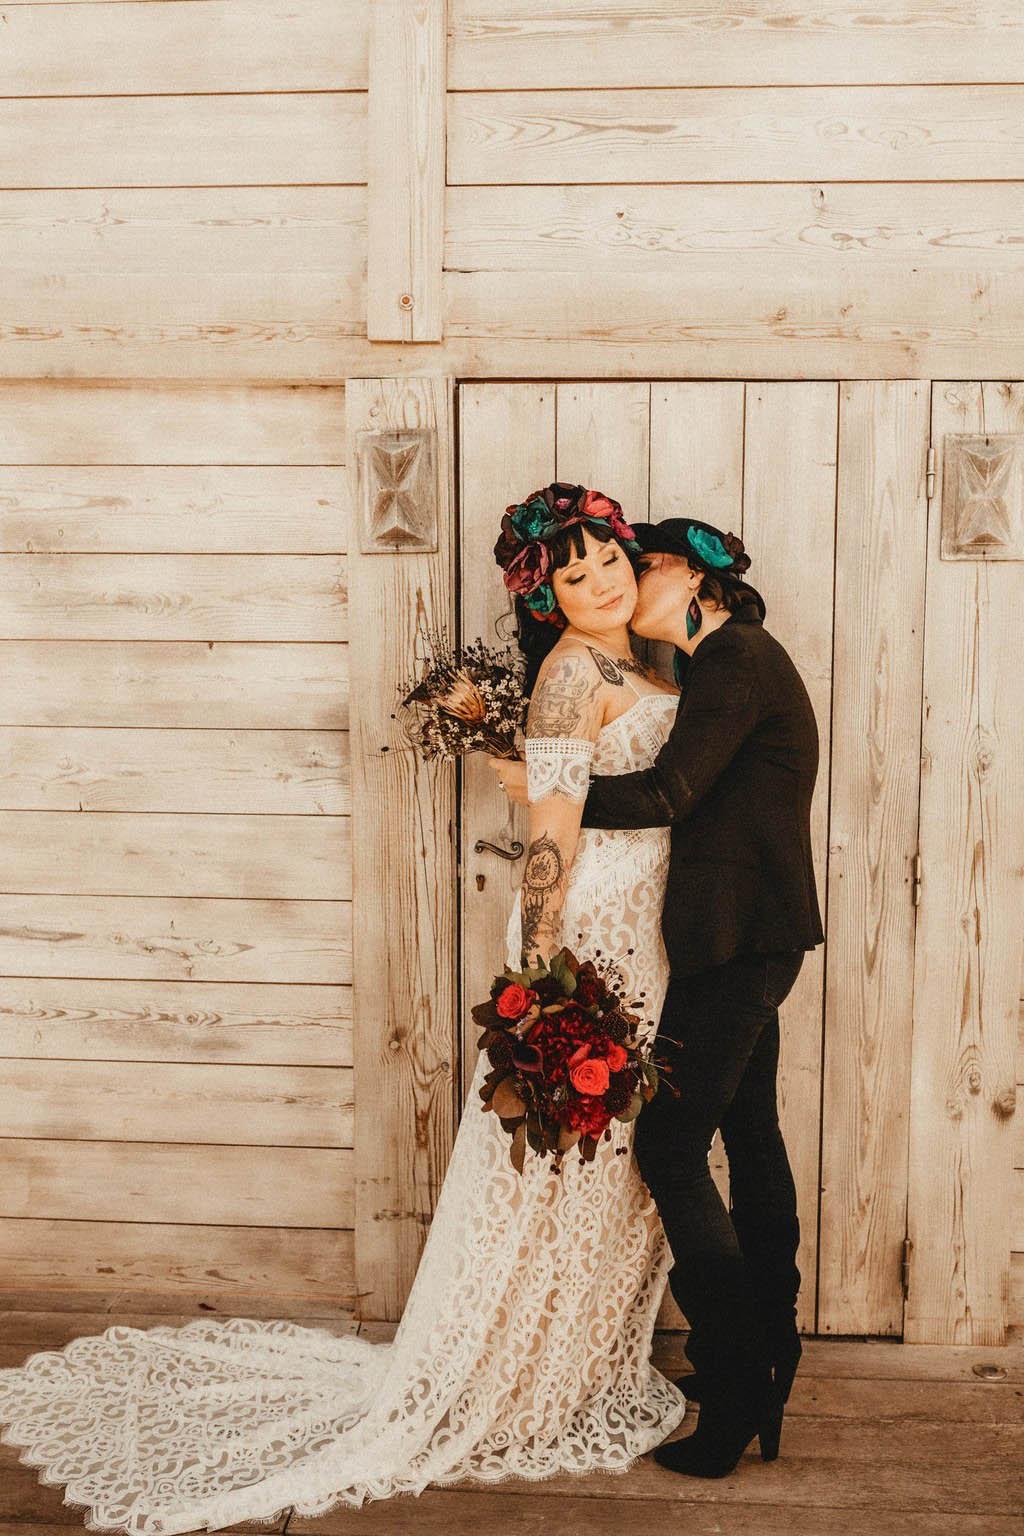 Alternative Same-Sex Wedding Inspiration - France - Dancing With Her